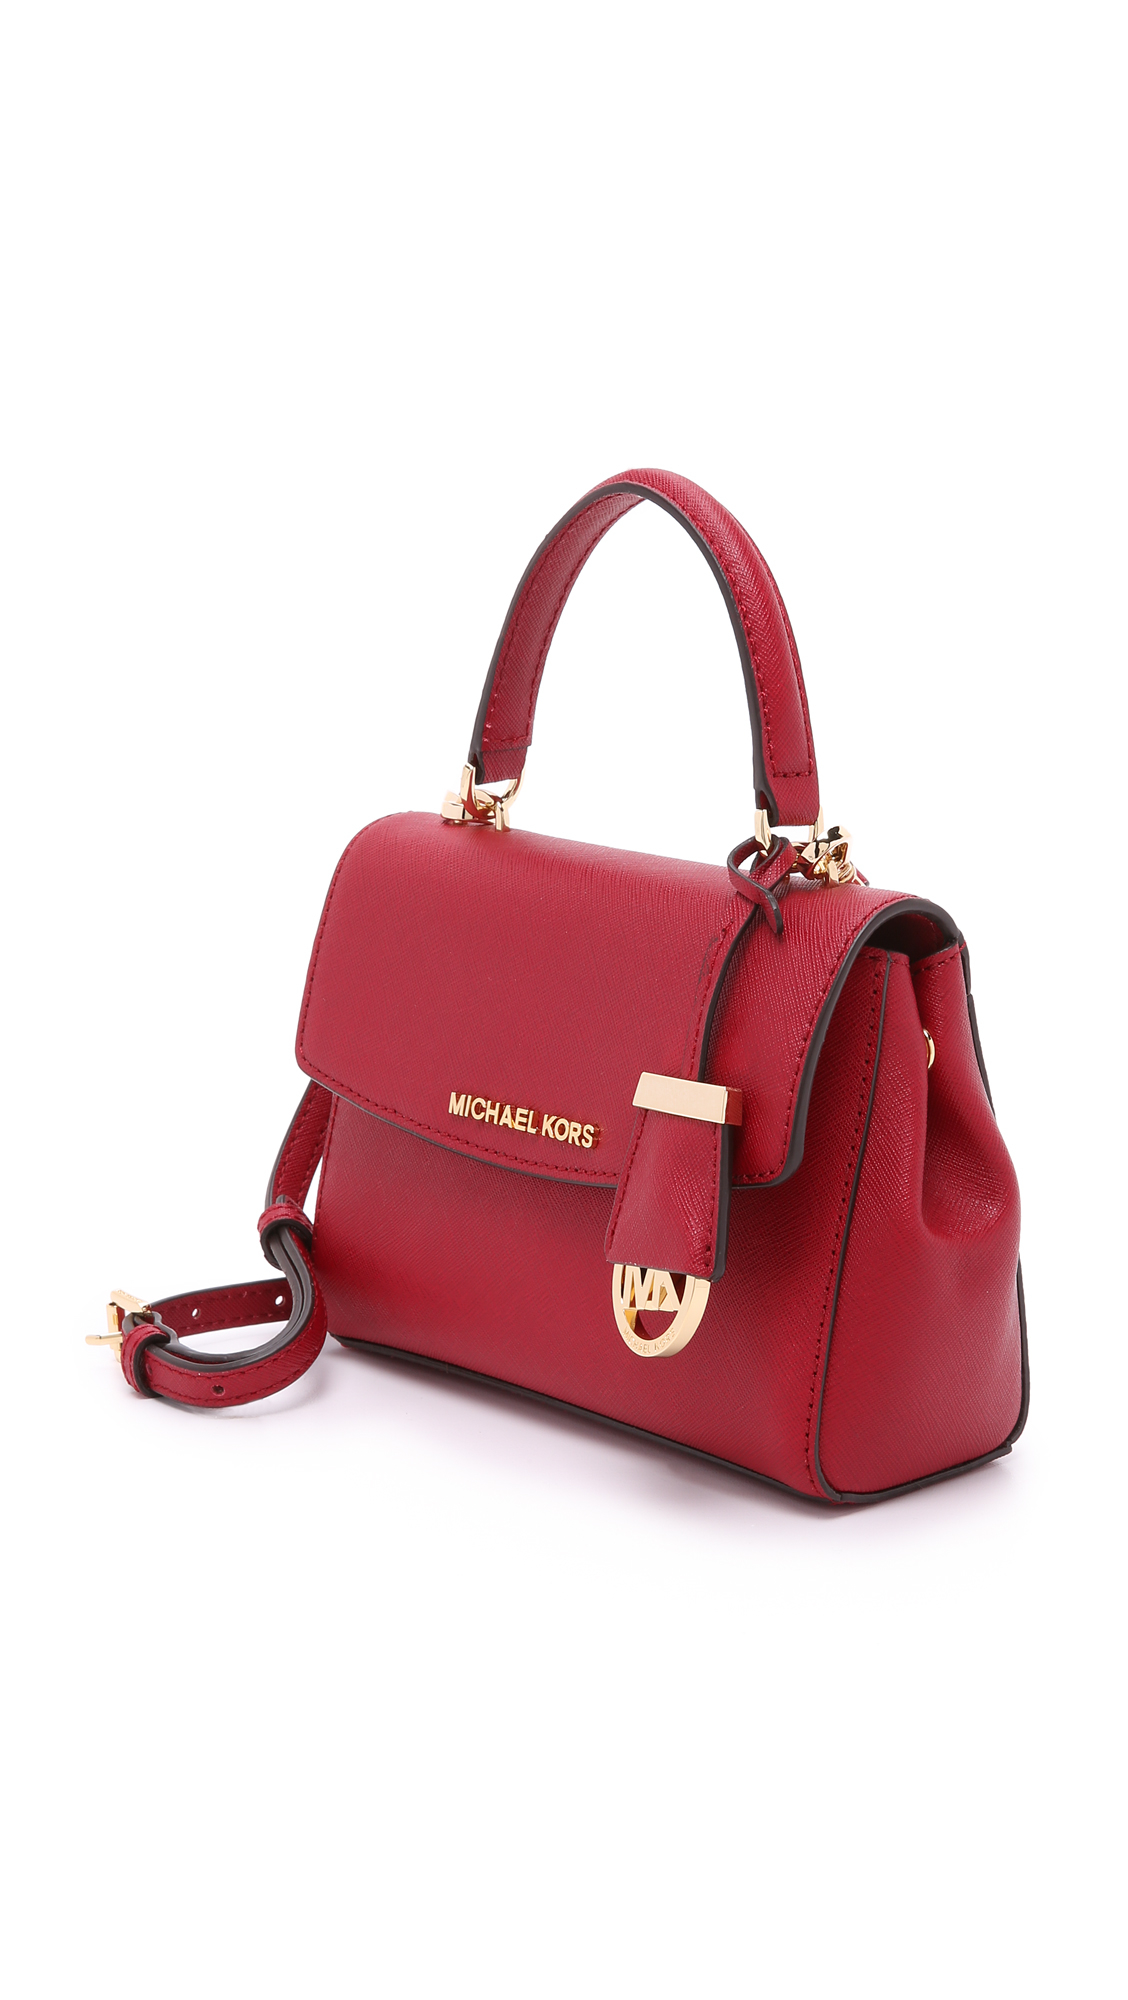 8c359333d2 ... low price lyst michael michael kors ava extra small cross body bag  cherry 6dd90 907c5